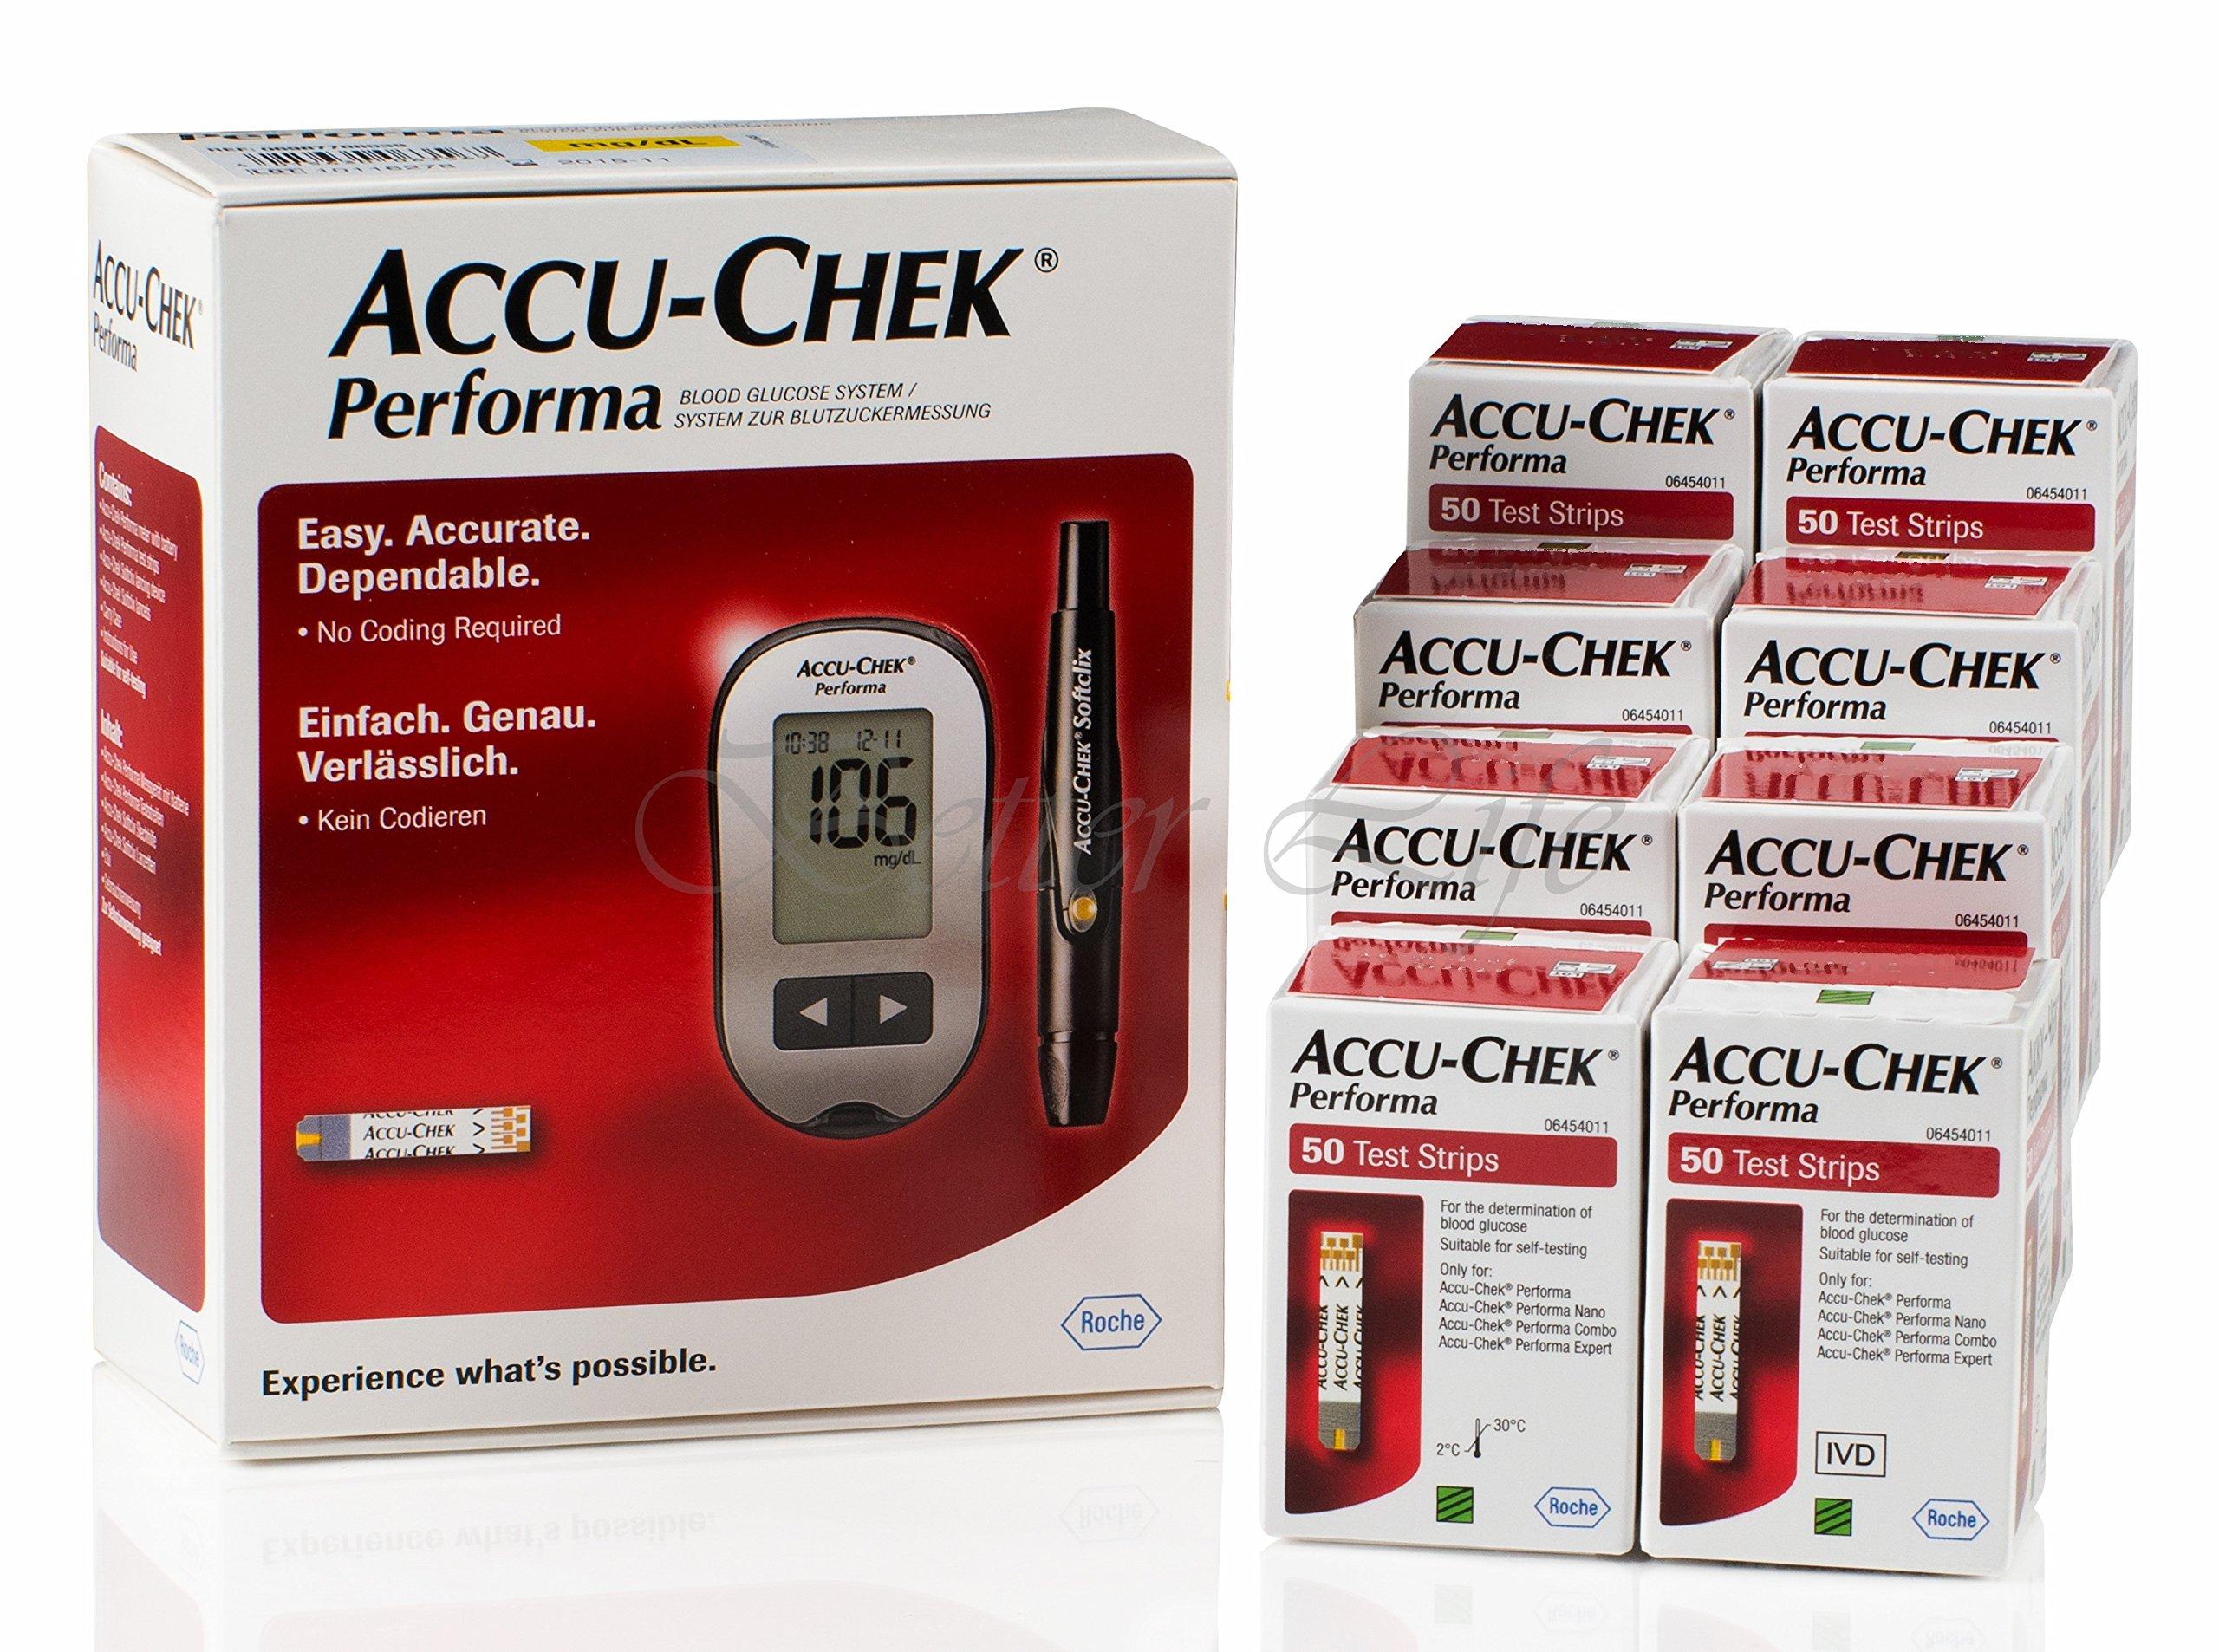 410 Accu Chek Performa Test Strips Plus Free Glucometer Kit Lancets Multiclix